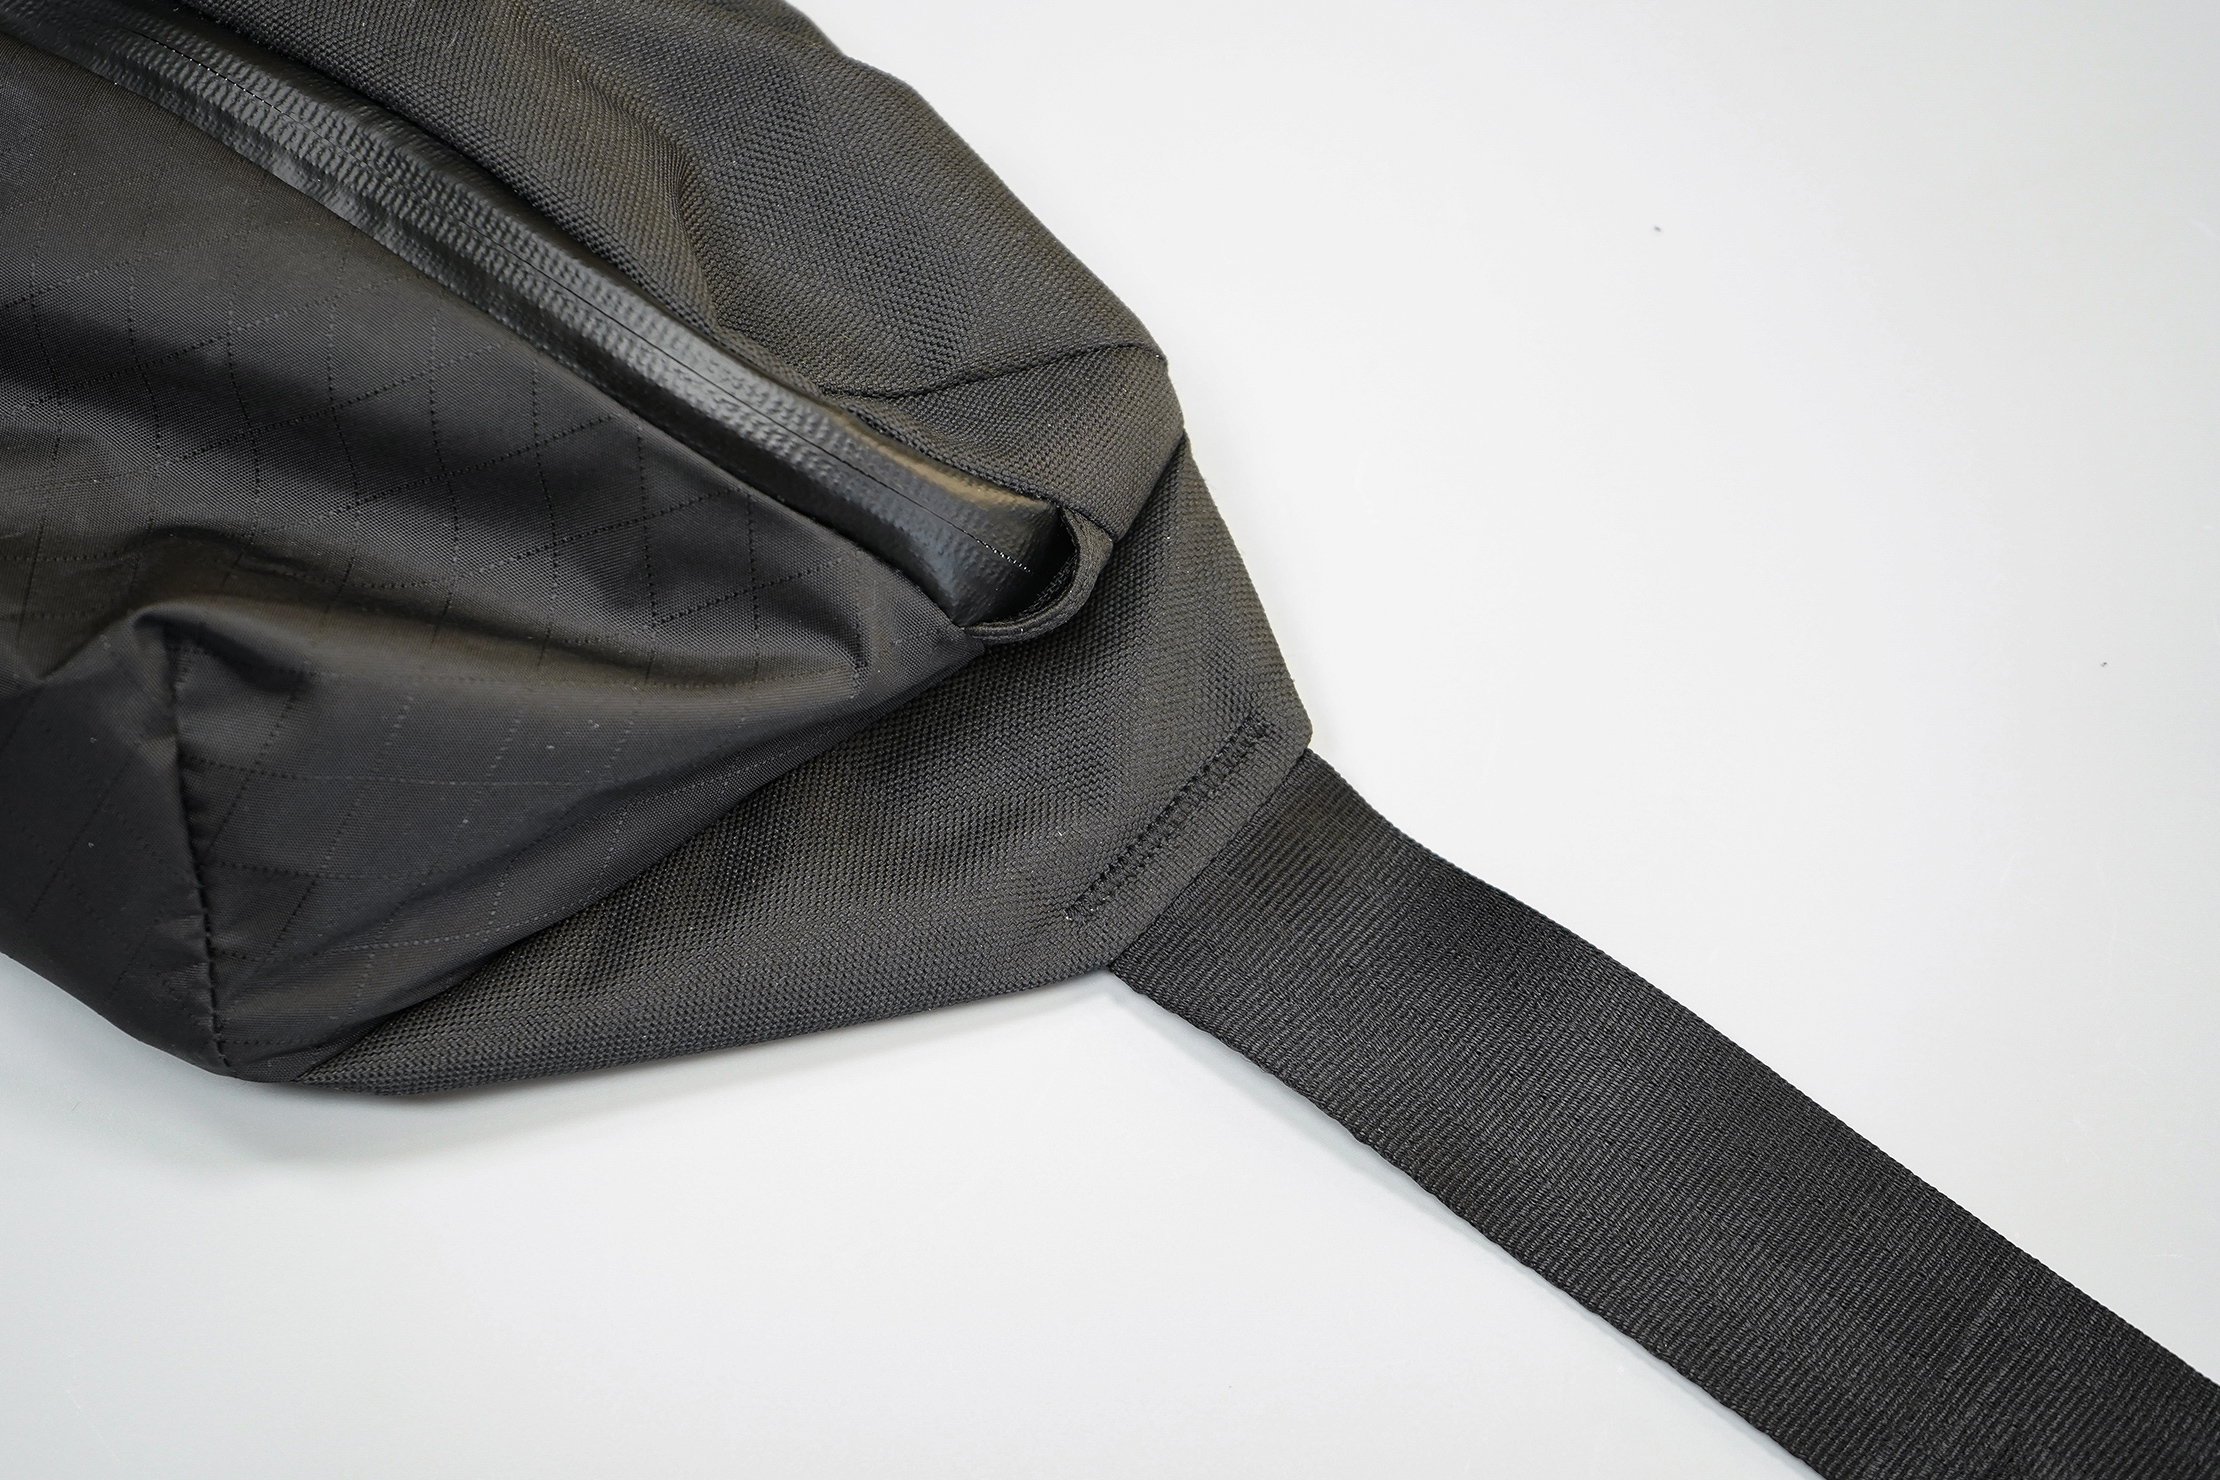 CamelBak Pivot Sling & Waist Pack Strap Attachment